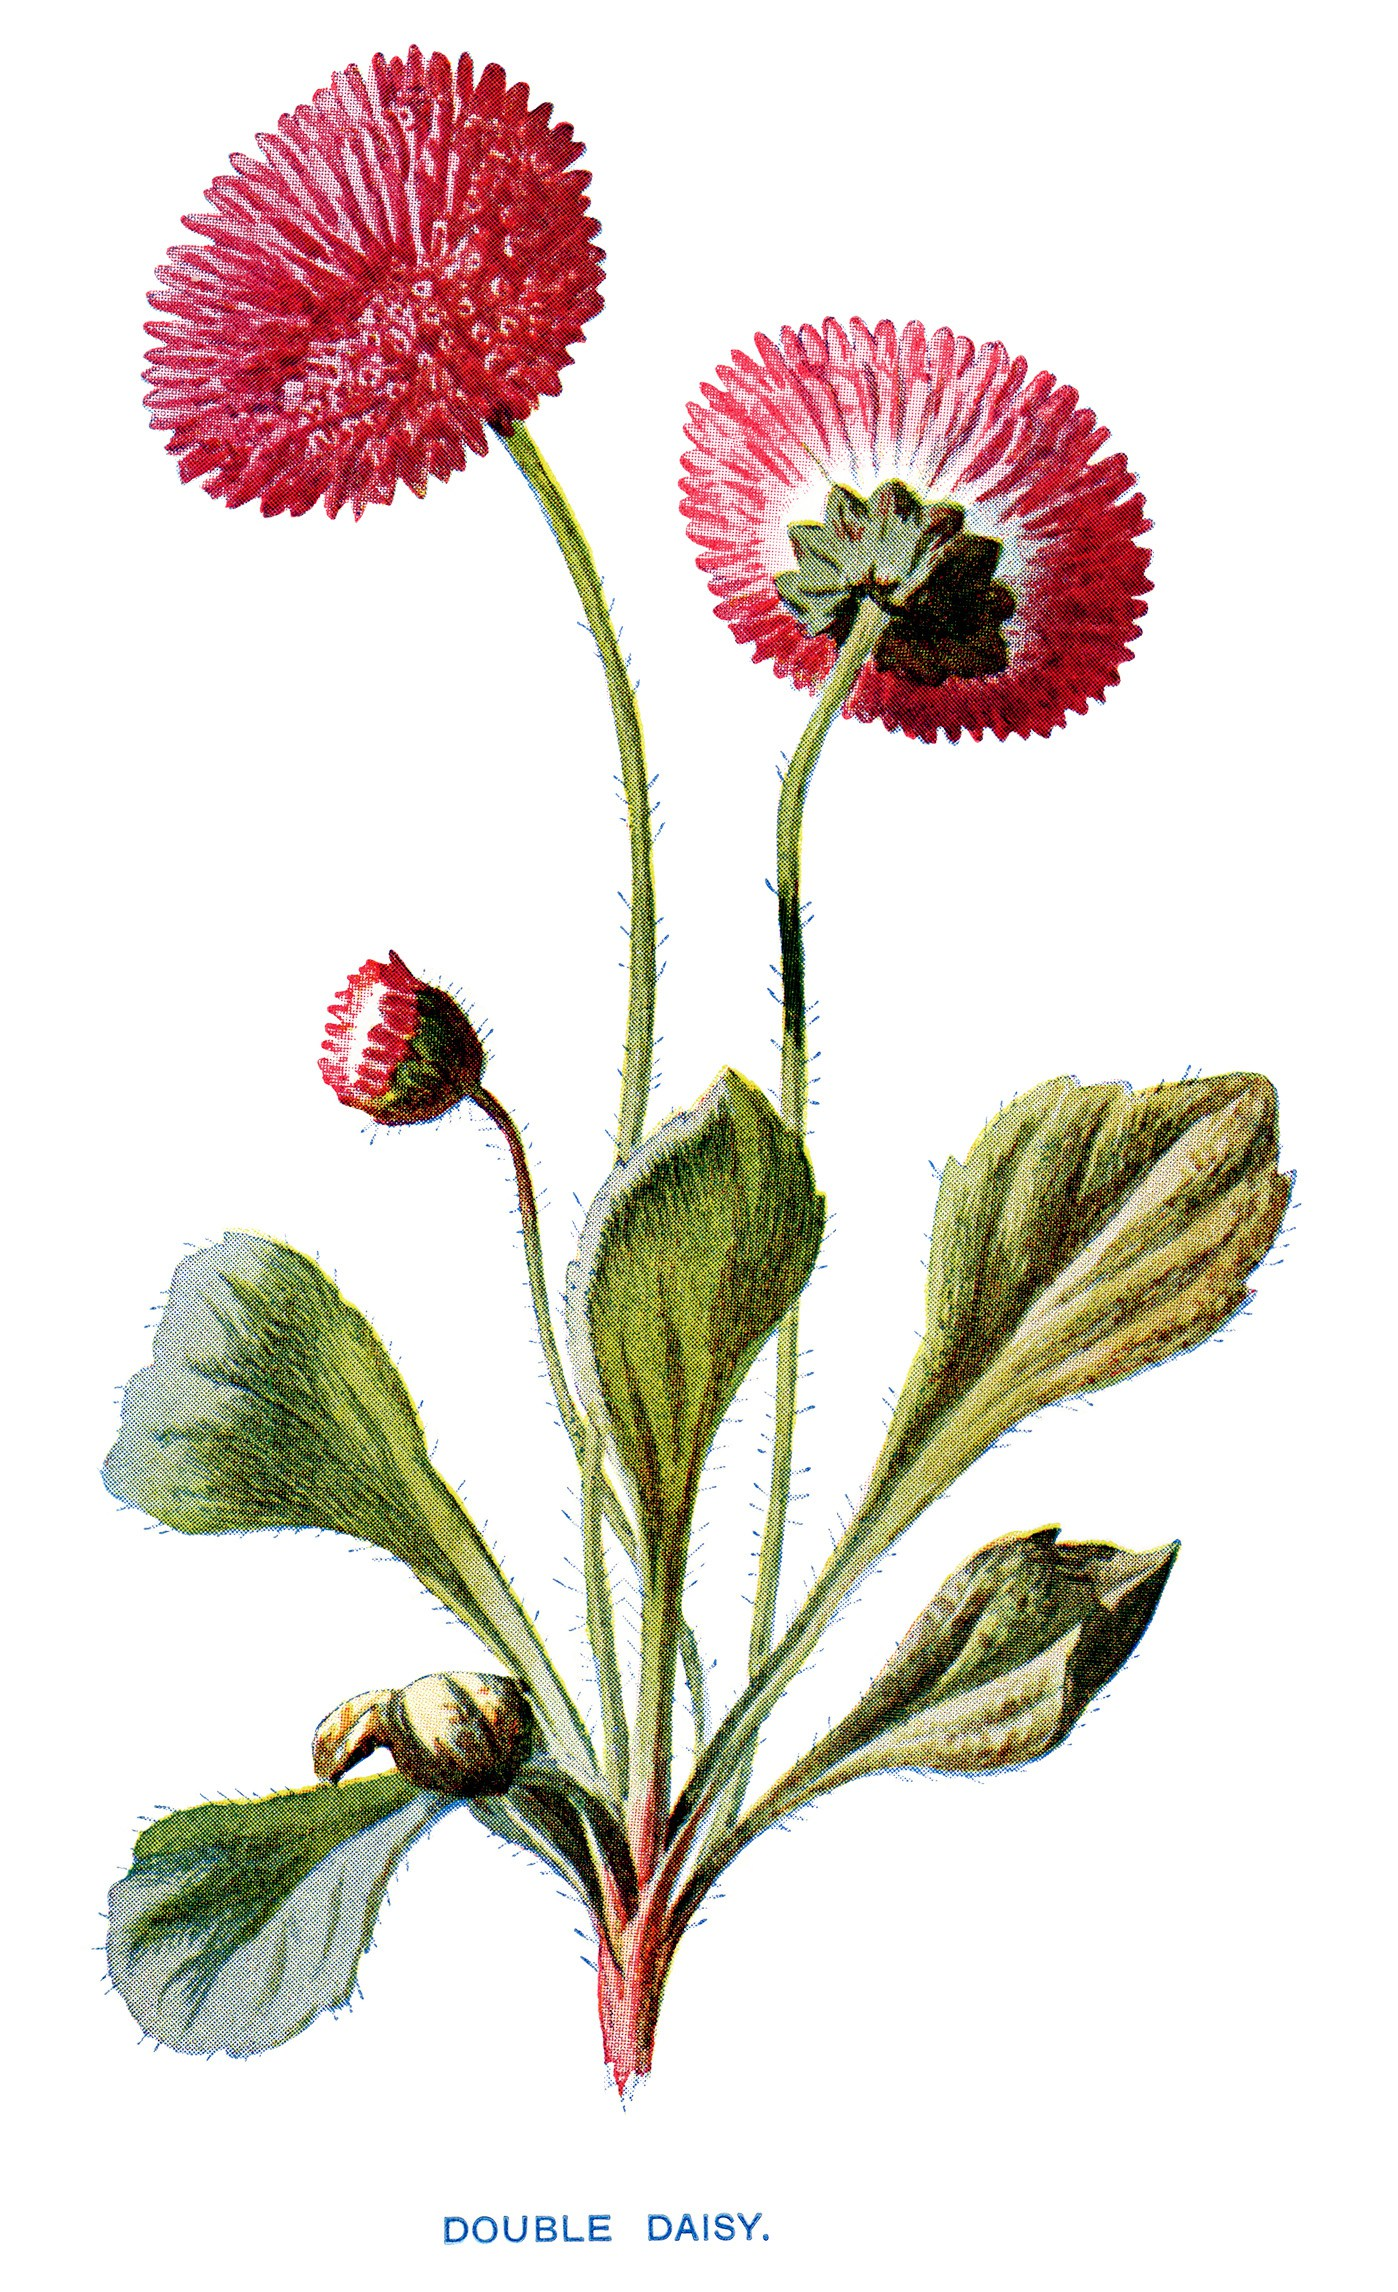 1398x2292 Free Vintage Clip Art Double Daisy Pink Flower Illustration